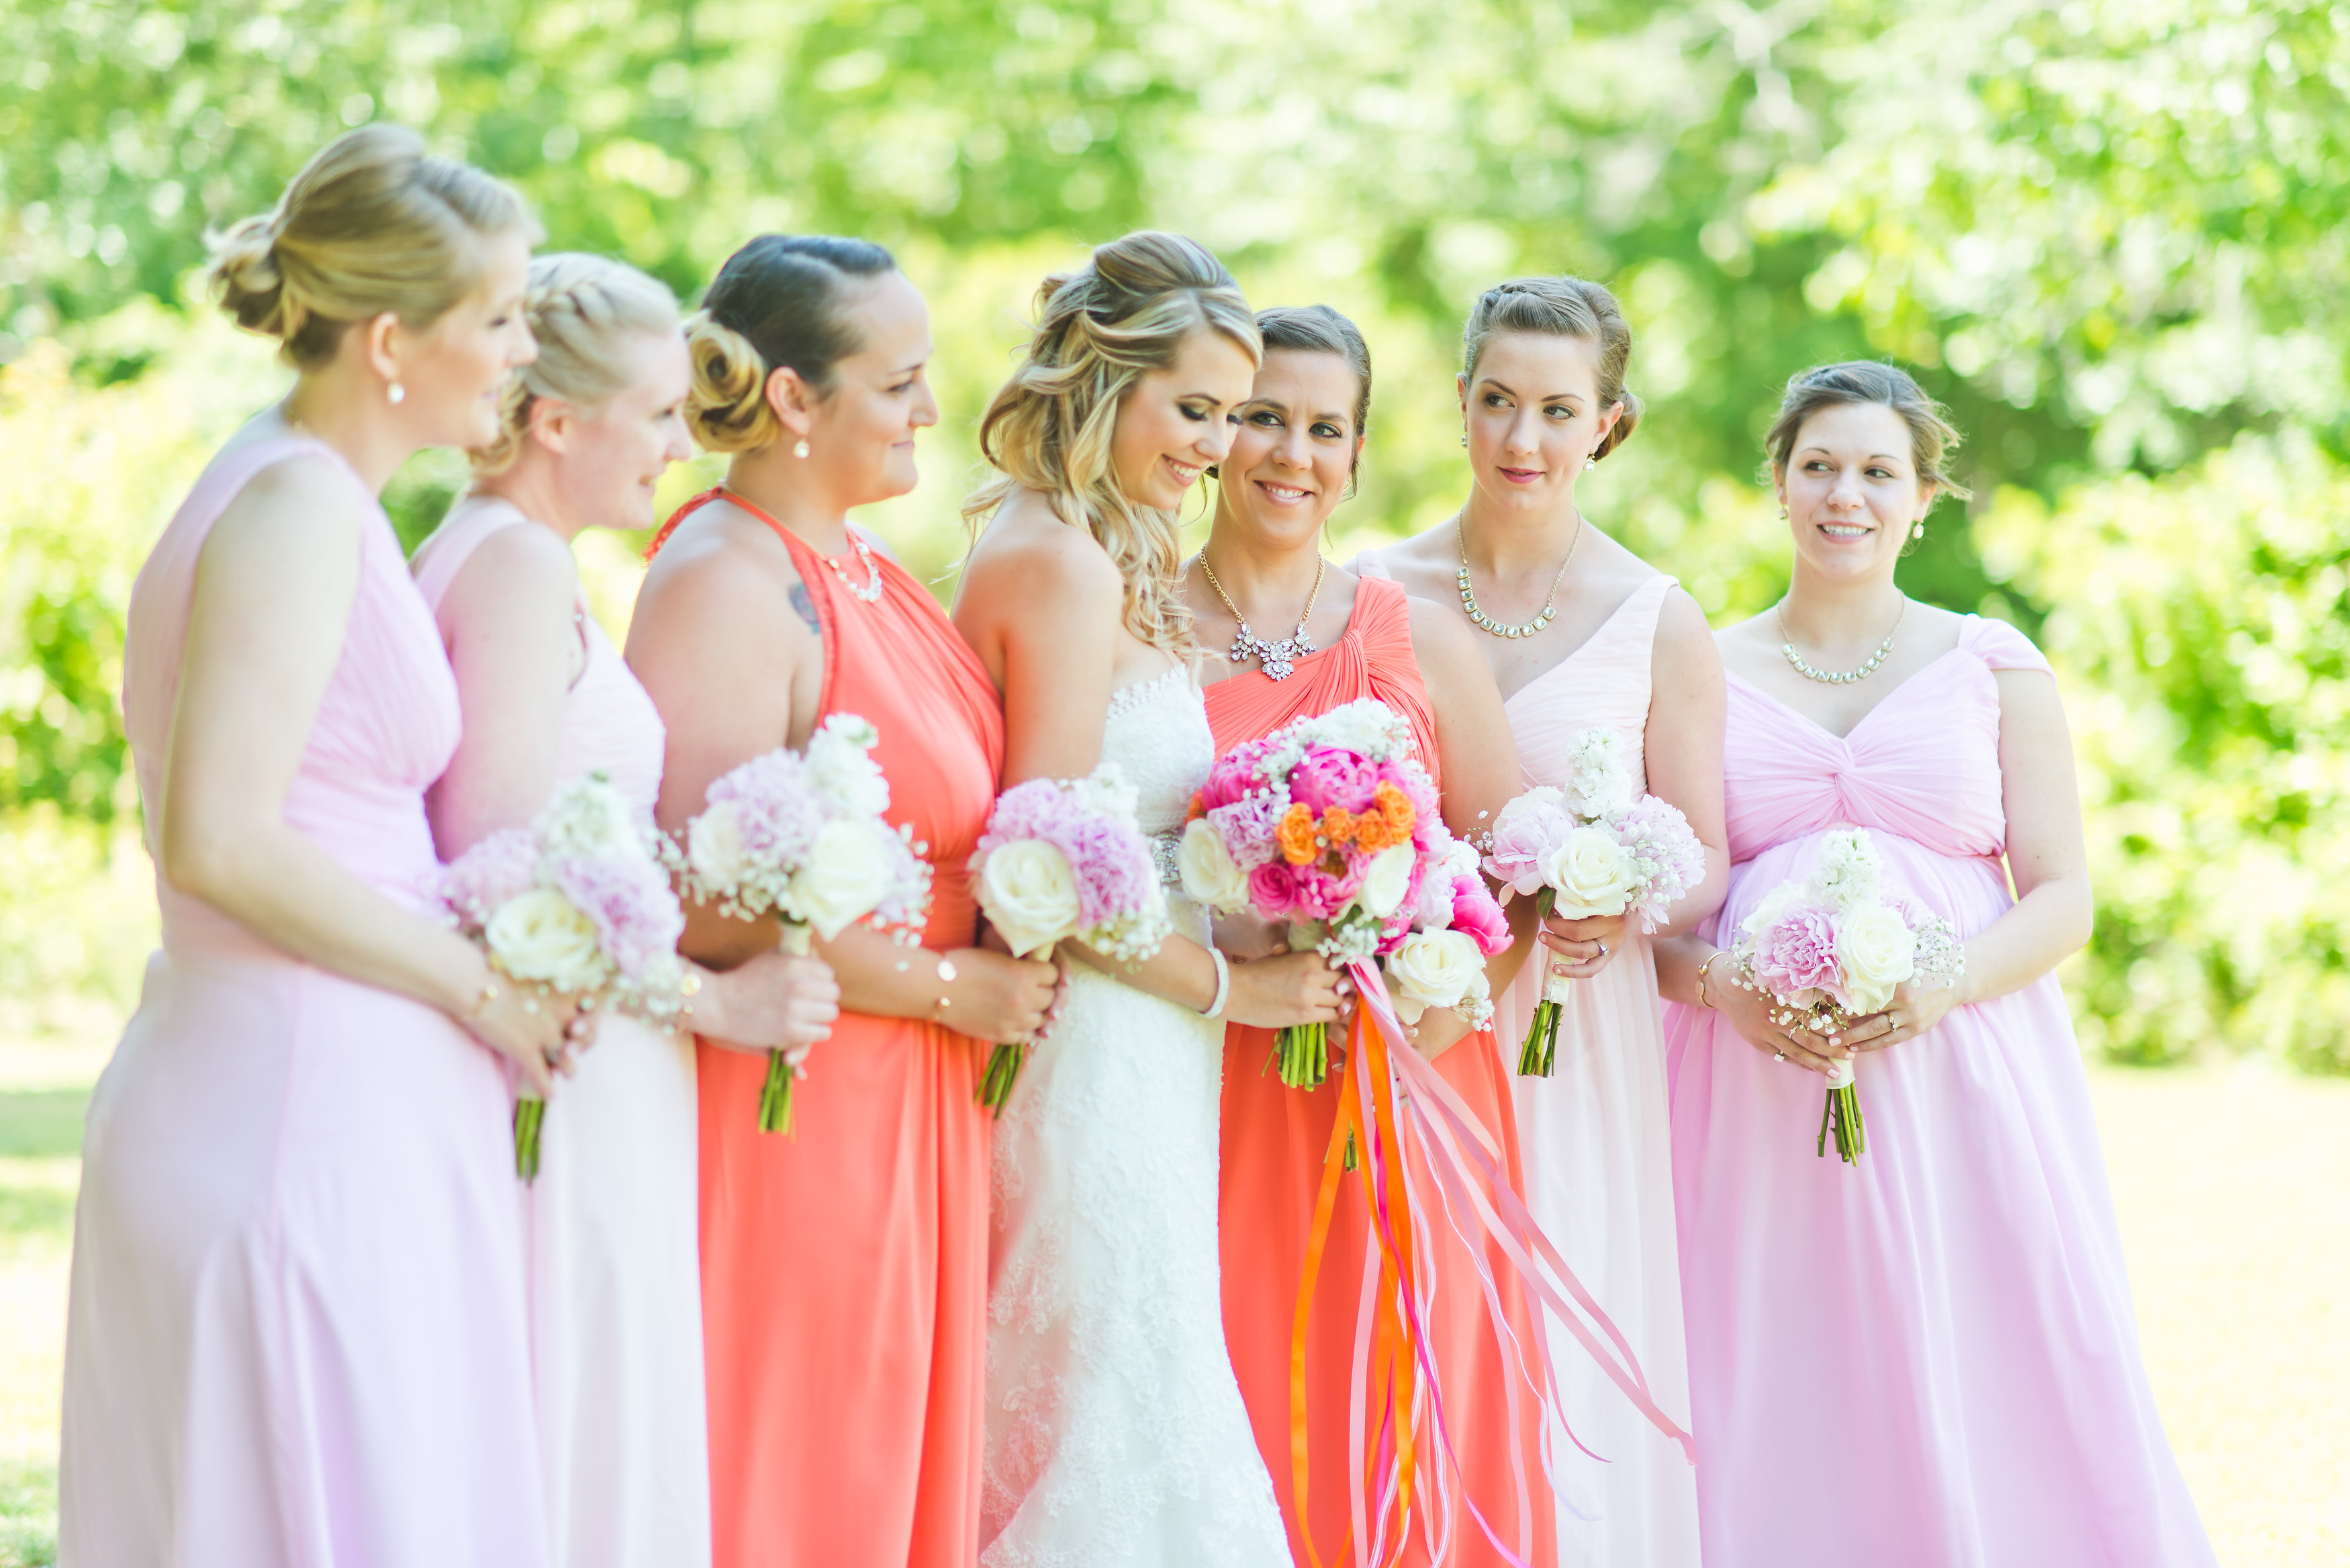 wiggins_wedding_preceremony-9682